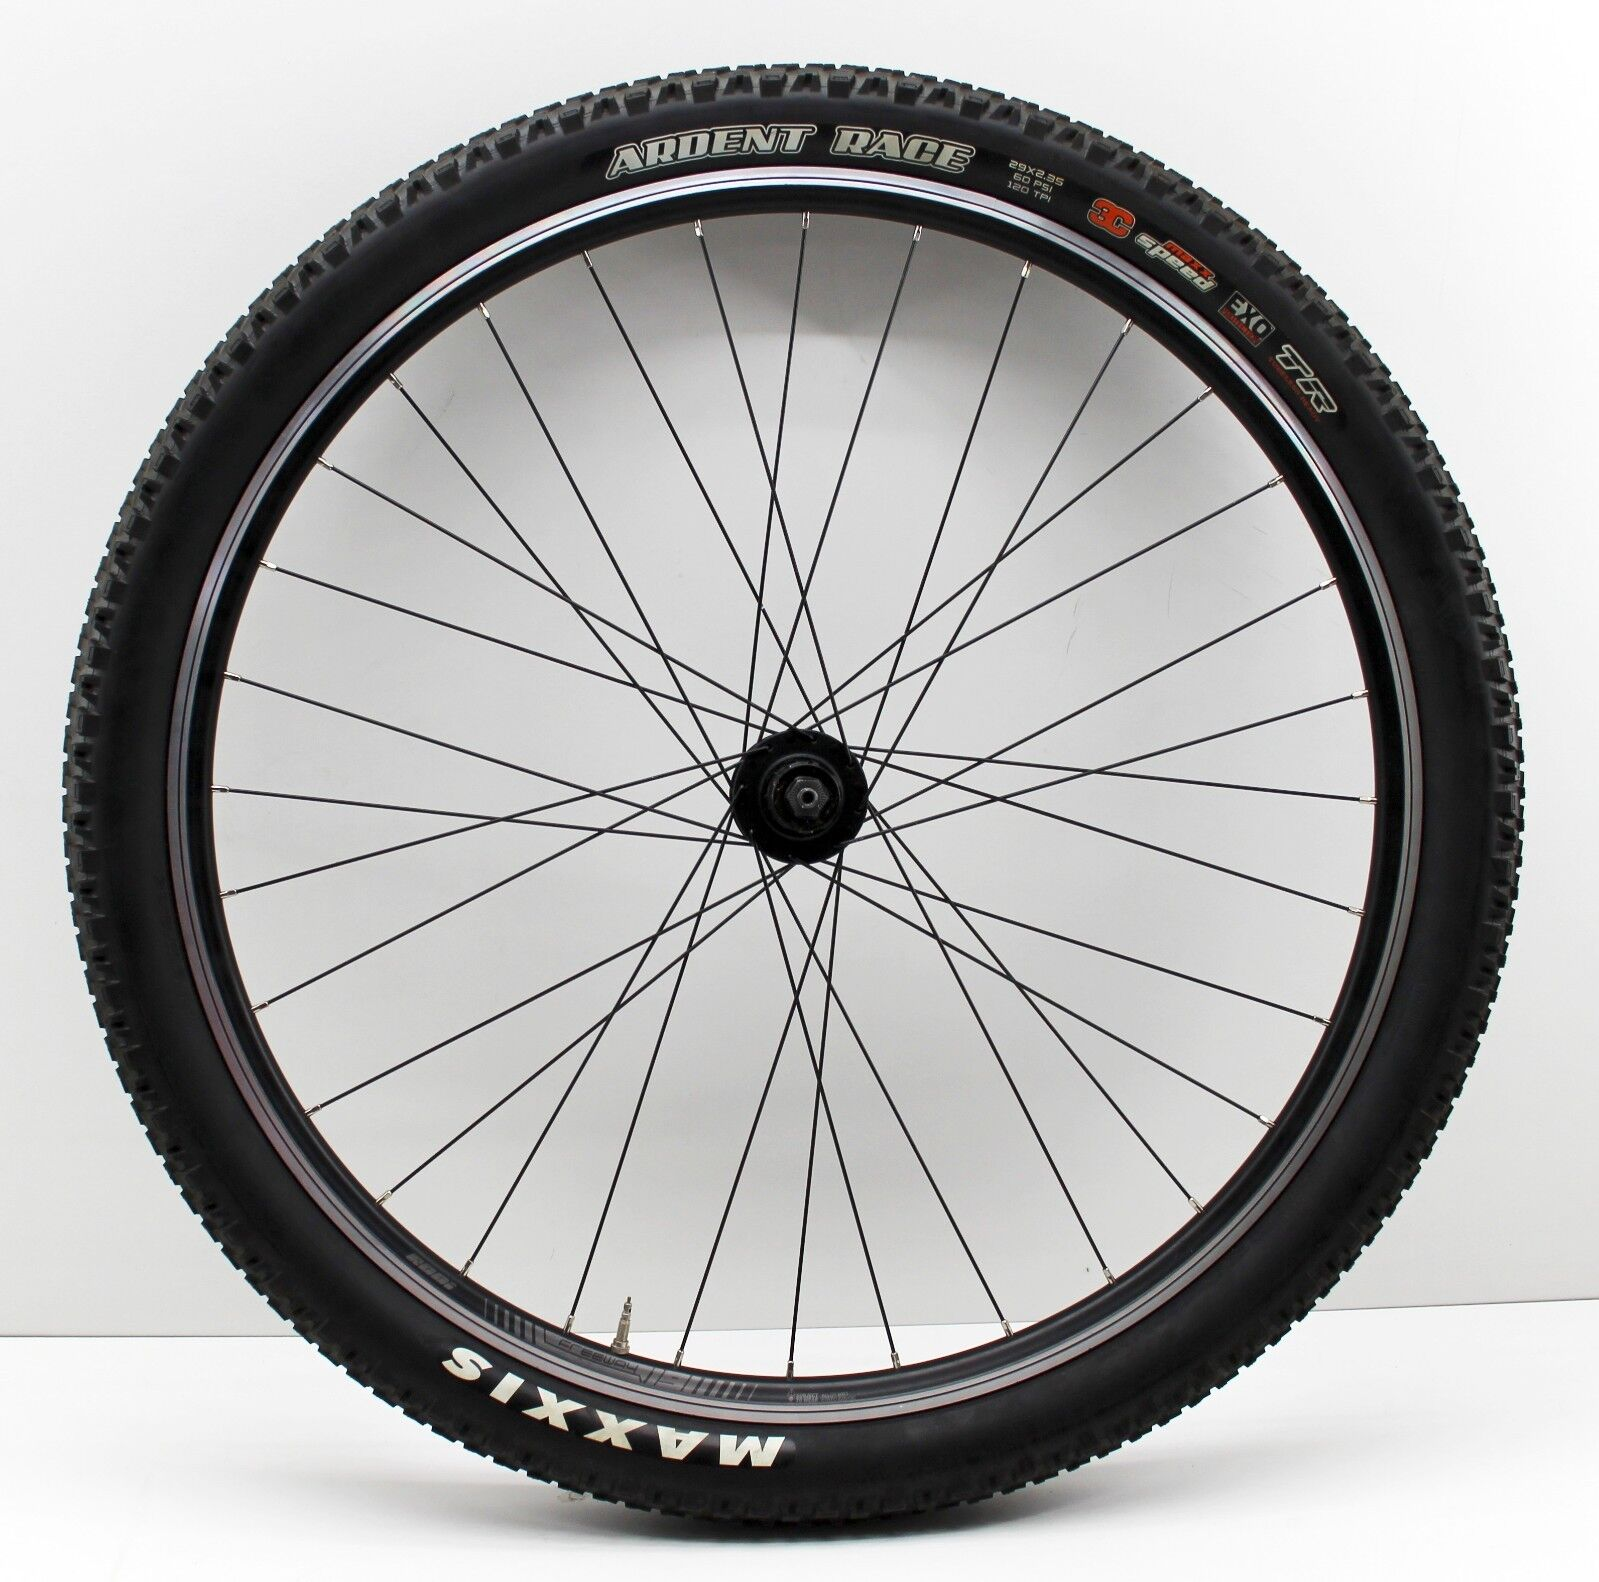 Run Bike Rear Rodi 29er Freeway 19, 6-hole, Tire Maxxis Ardent Race 29 x 2,3